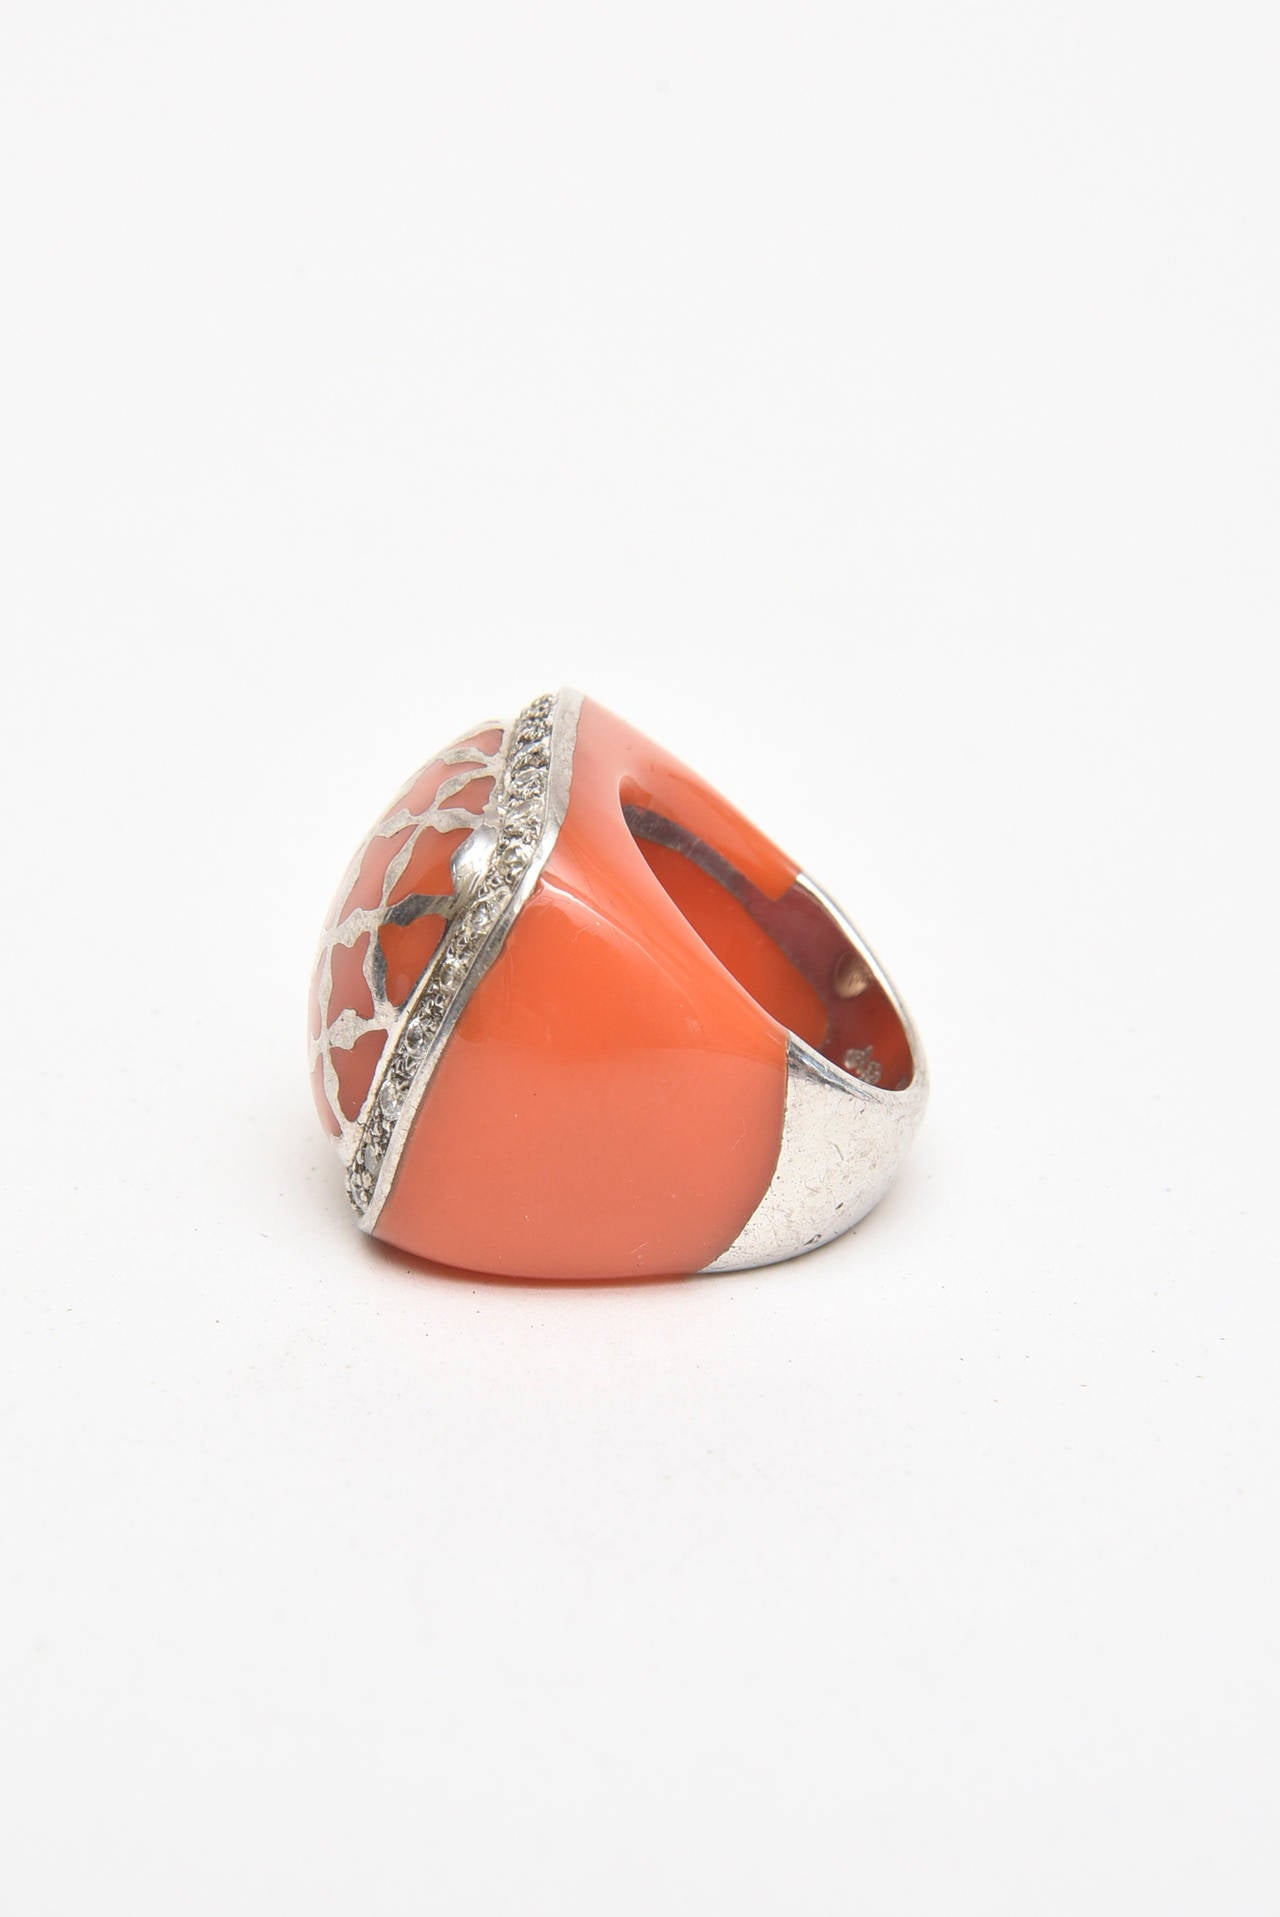 Angelique de Paris Sterling Silver, Rhinestone & Resin Dome Ring In Good Condition For Sale In North Miami, FL